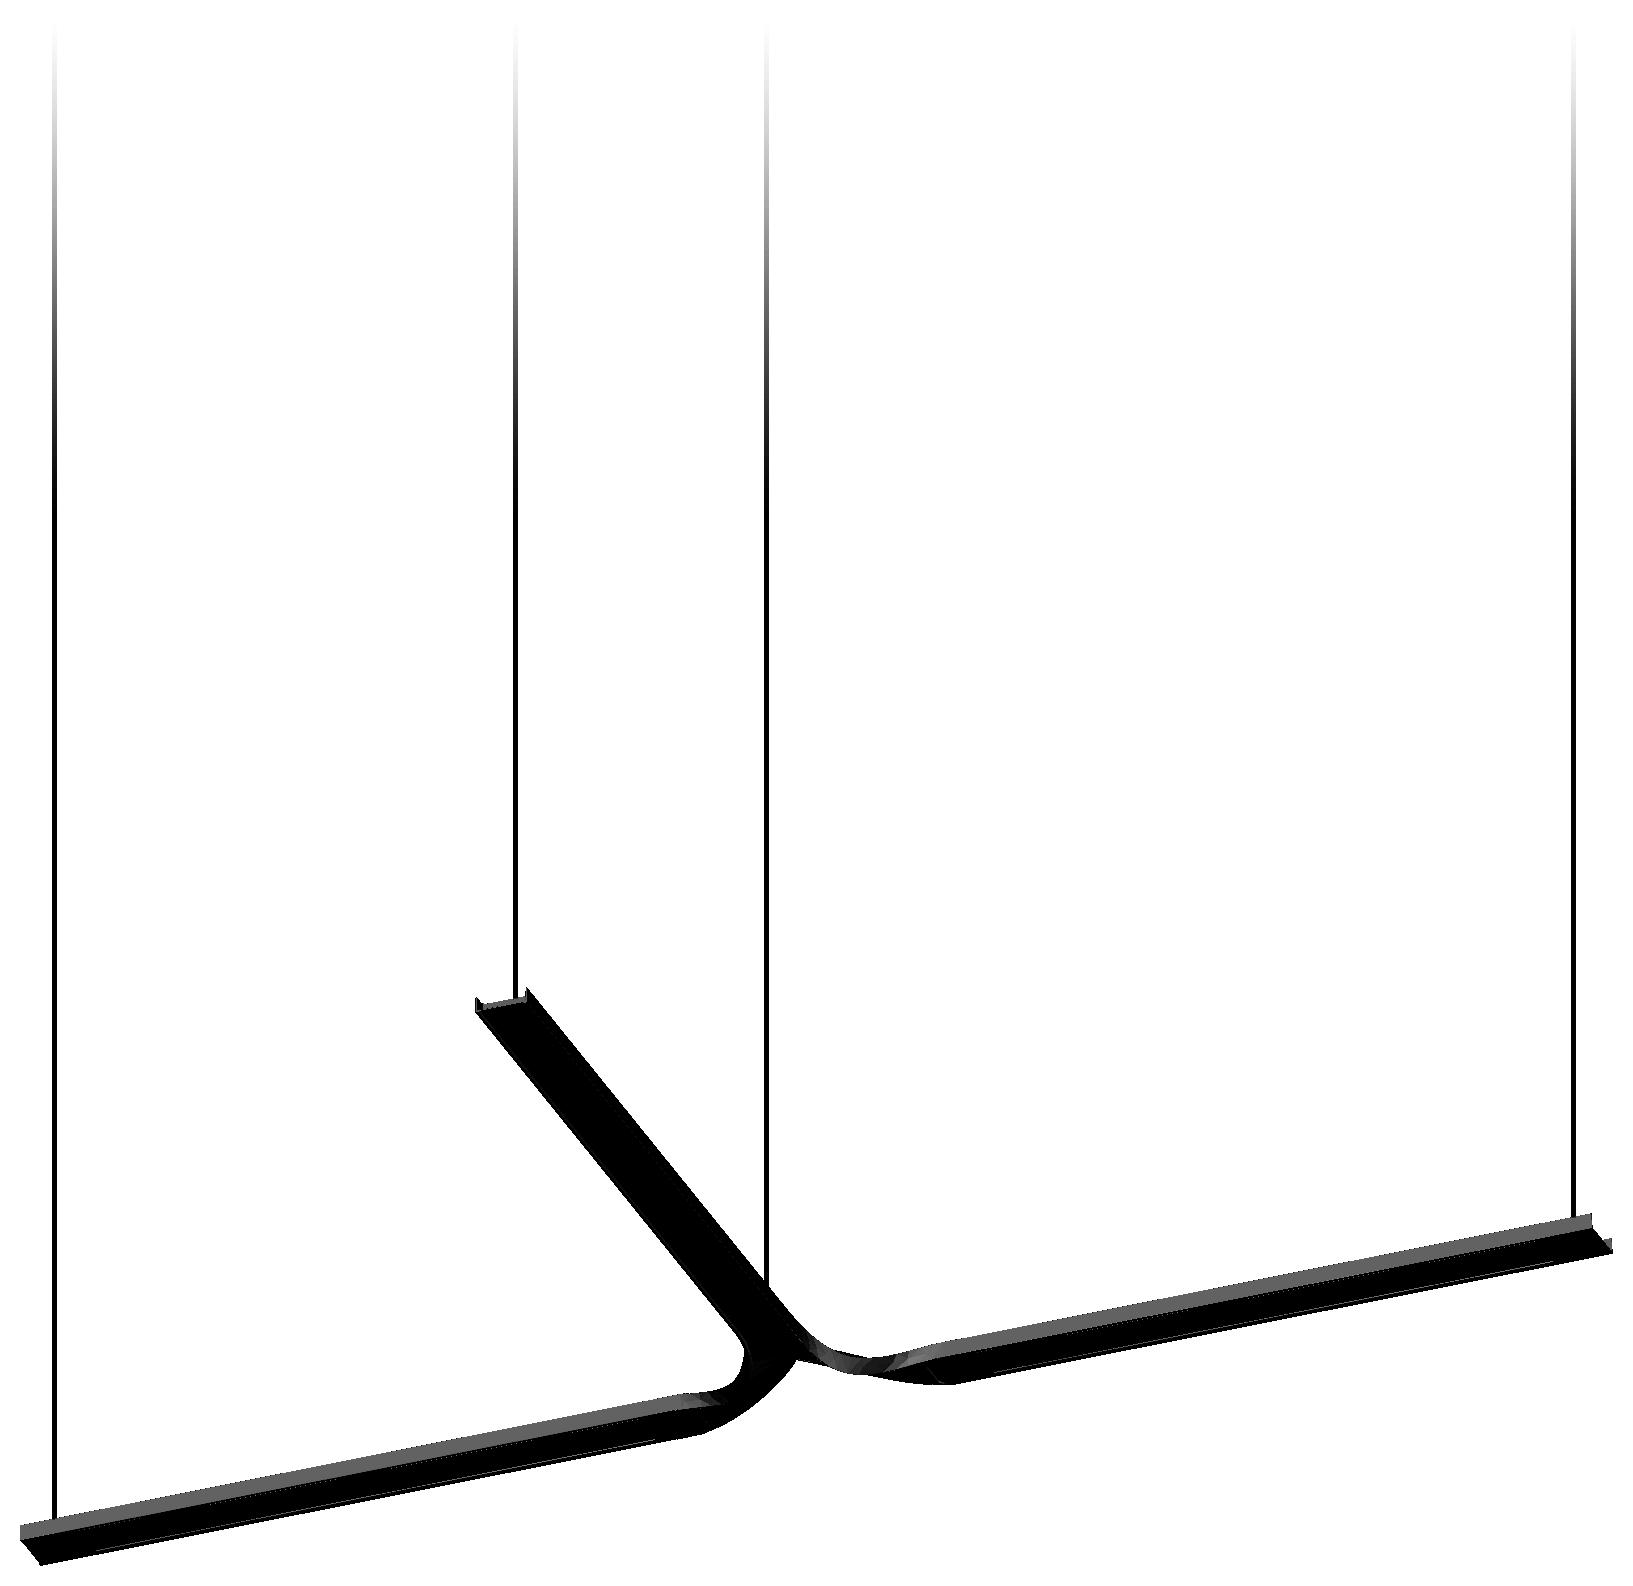 center-configuration-example